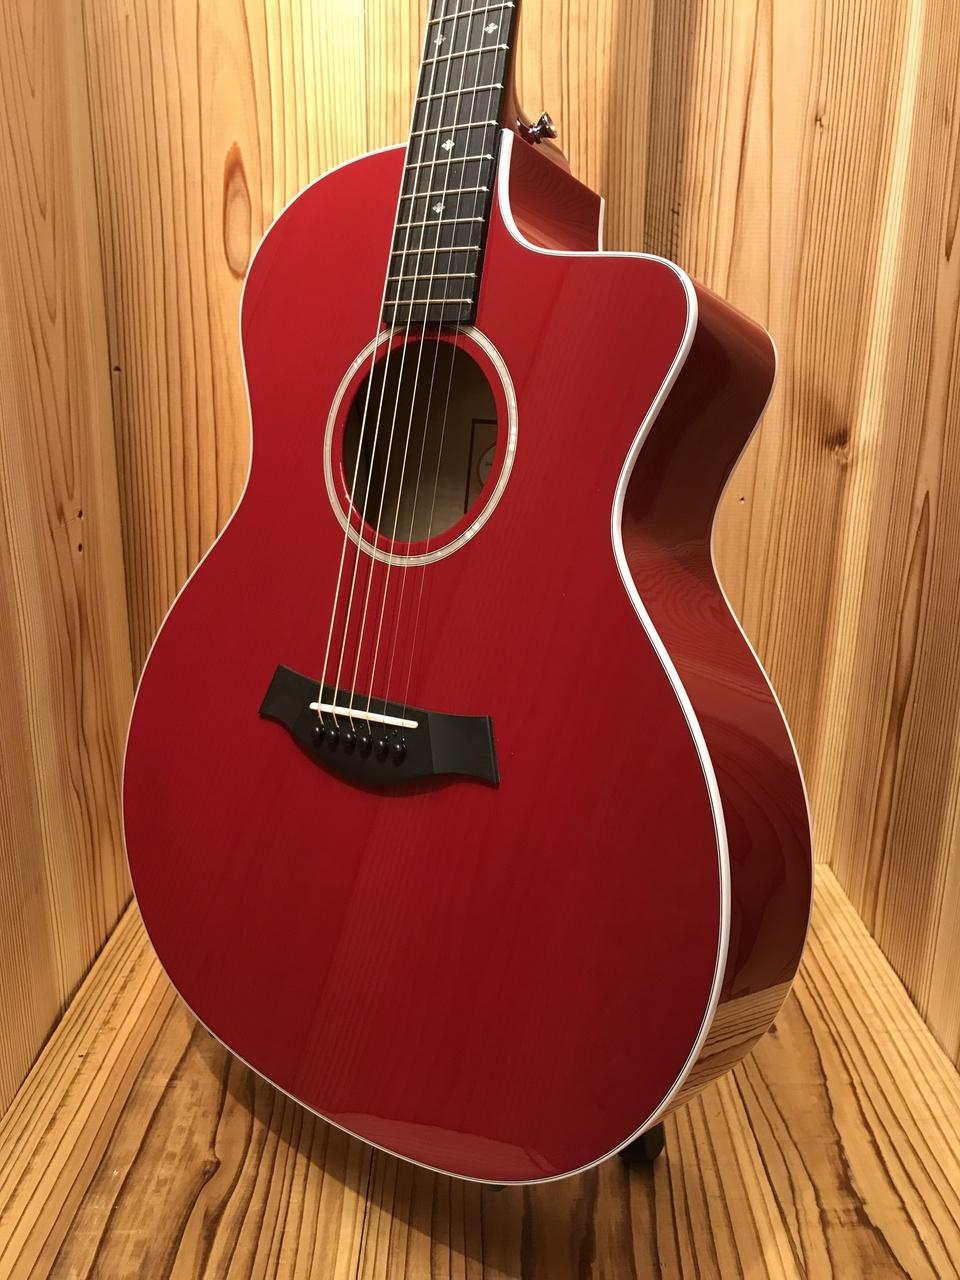 Taylor 214ce DLX RED【新品】 【メイプル材ボディ】【ES2ピックアップ搭載】 【メキシコ製】